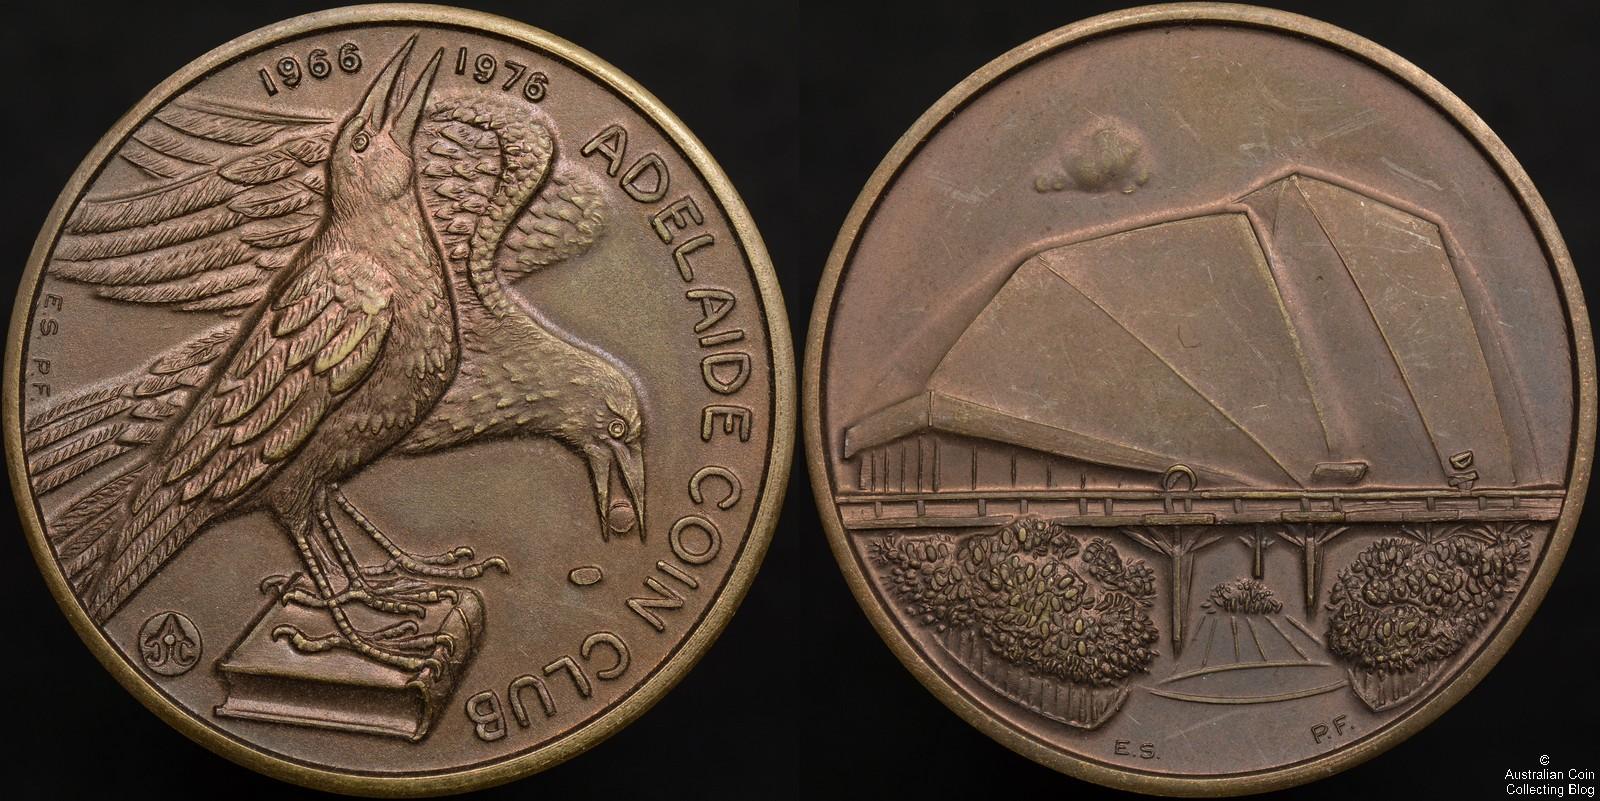 Adelaide Coin Club Medallion 1975